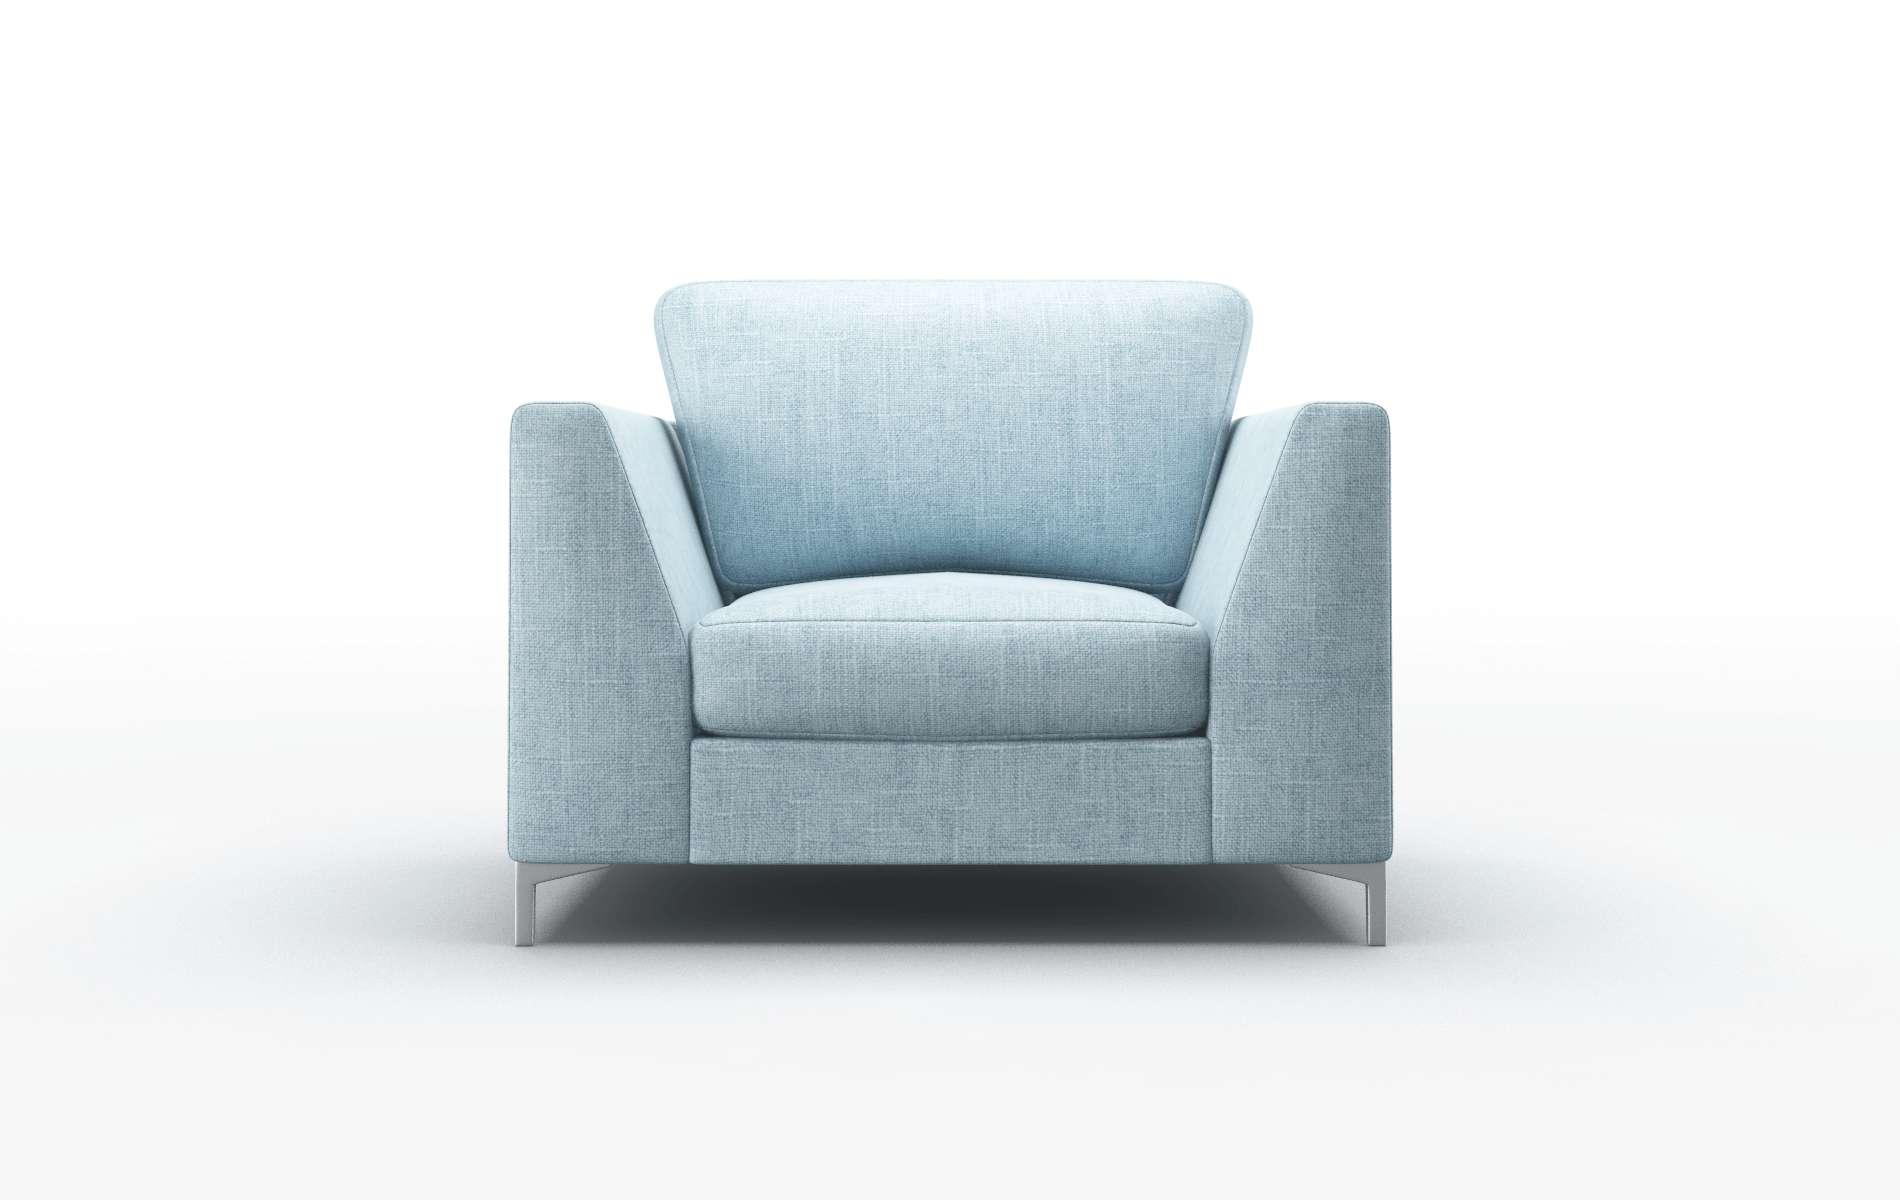 Royal Atlas Turquoise chair metal legs